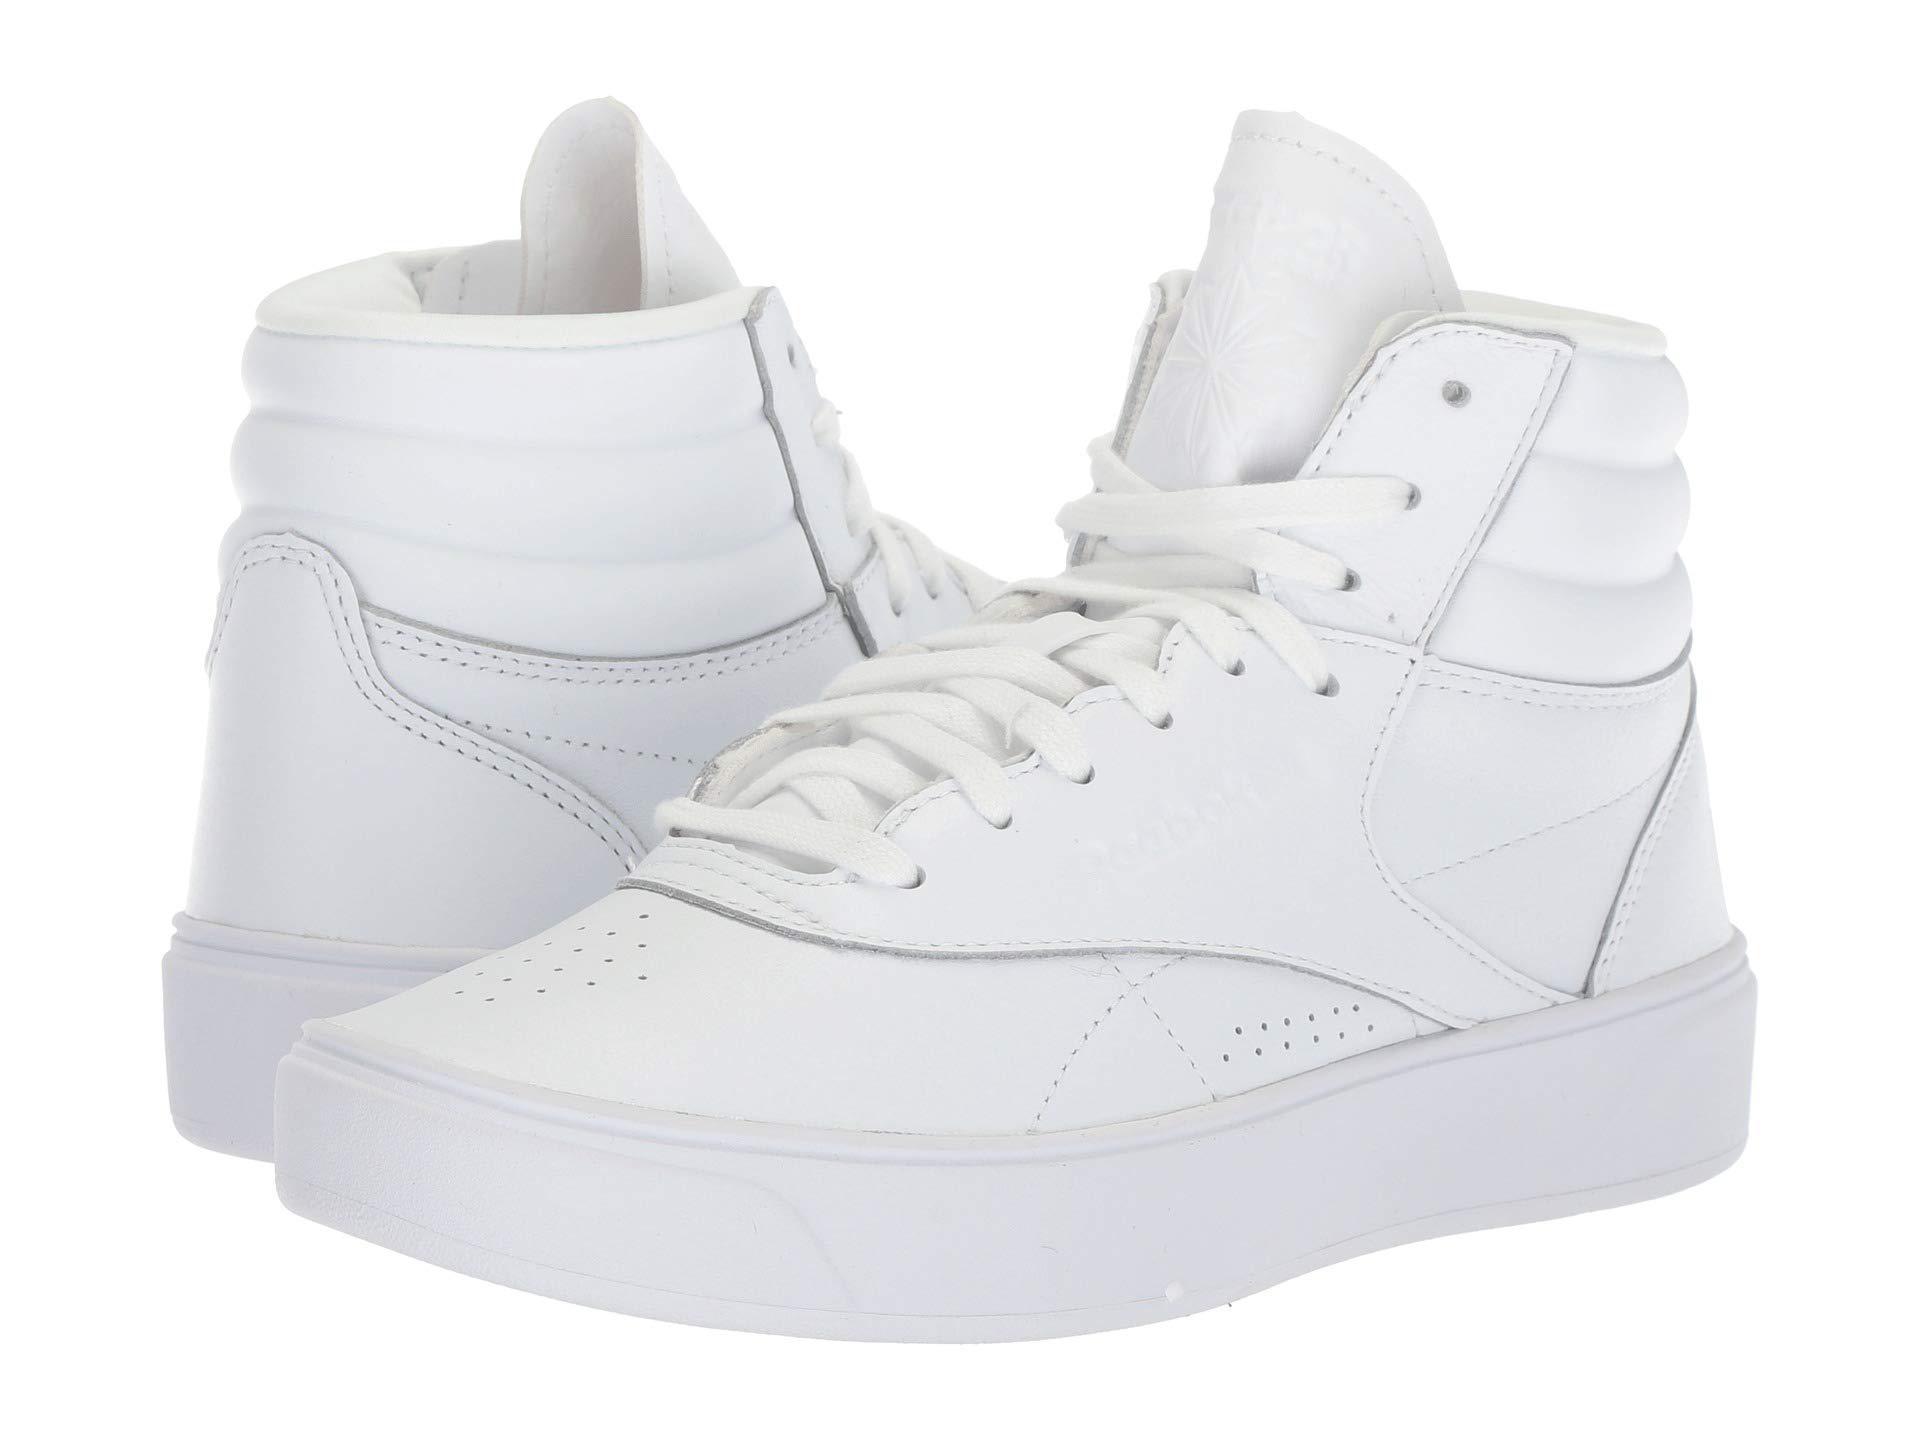 Lyst - Reebok Freestyle Hi Nova (white) Women s Classic Shoes in White 284fedd0e